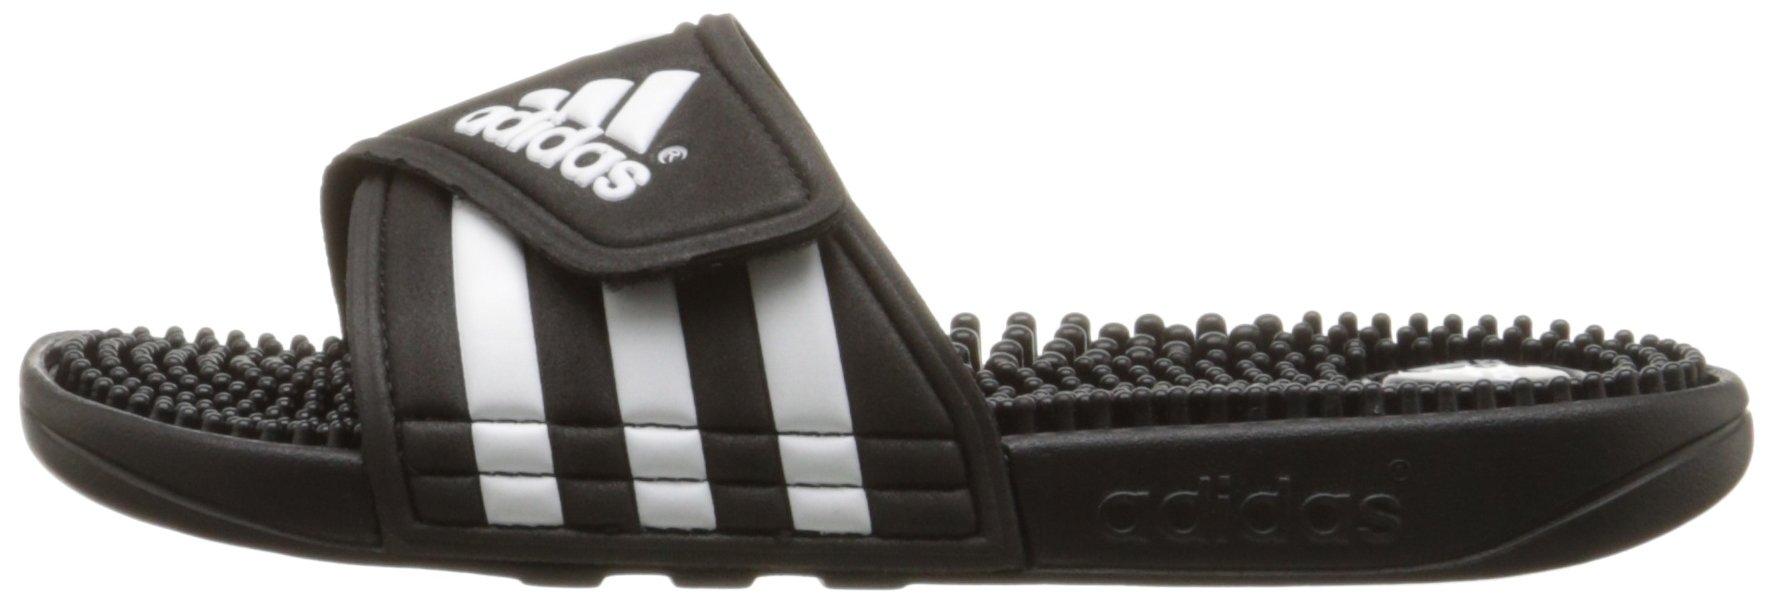 99a41b64ca3 adidas Women s adissage Slide